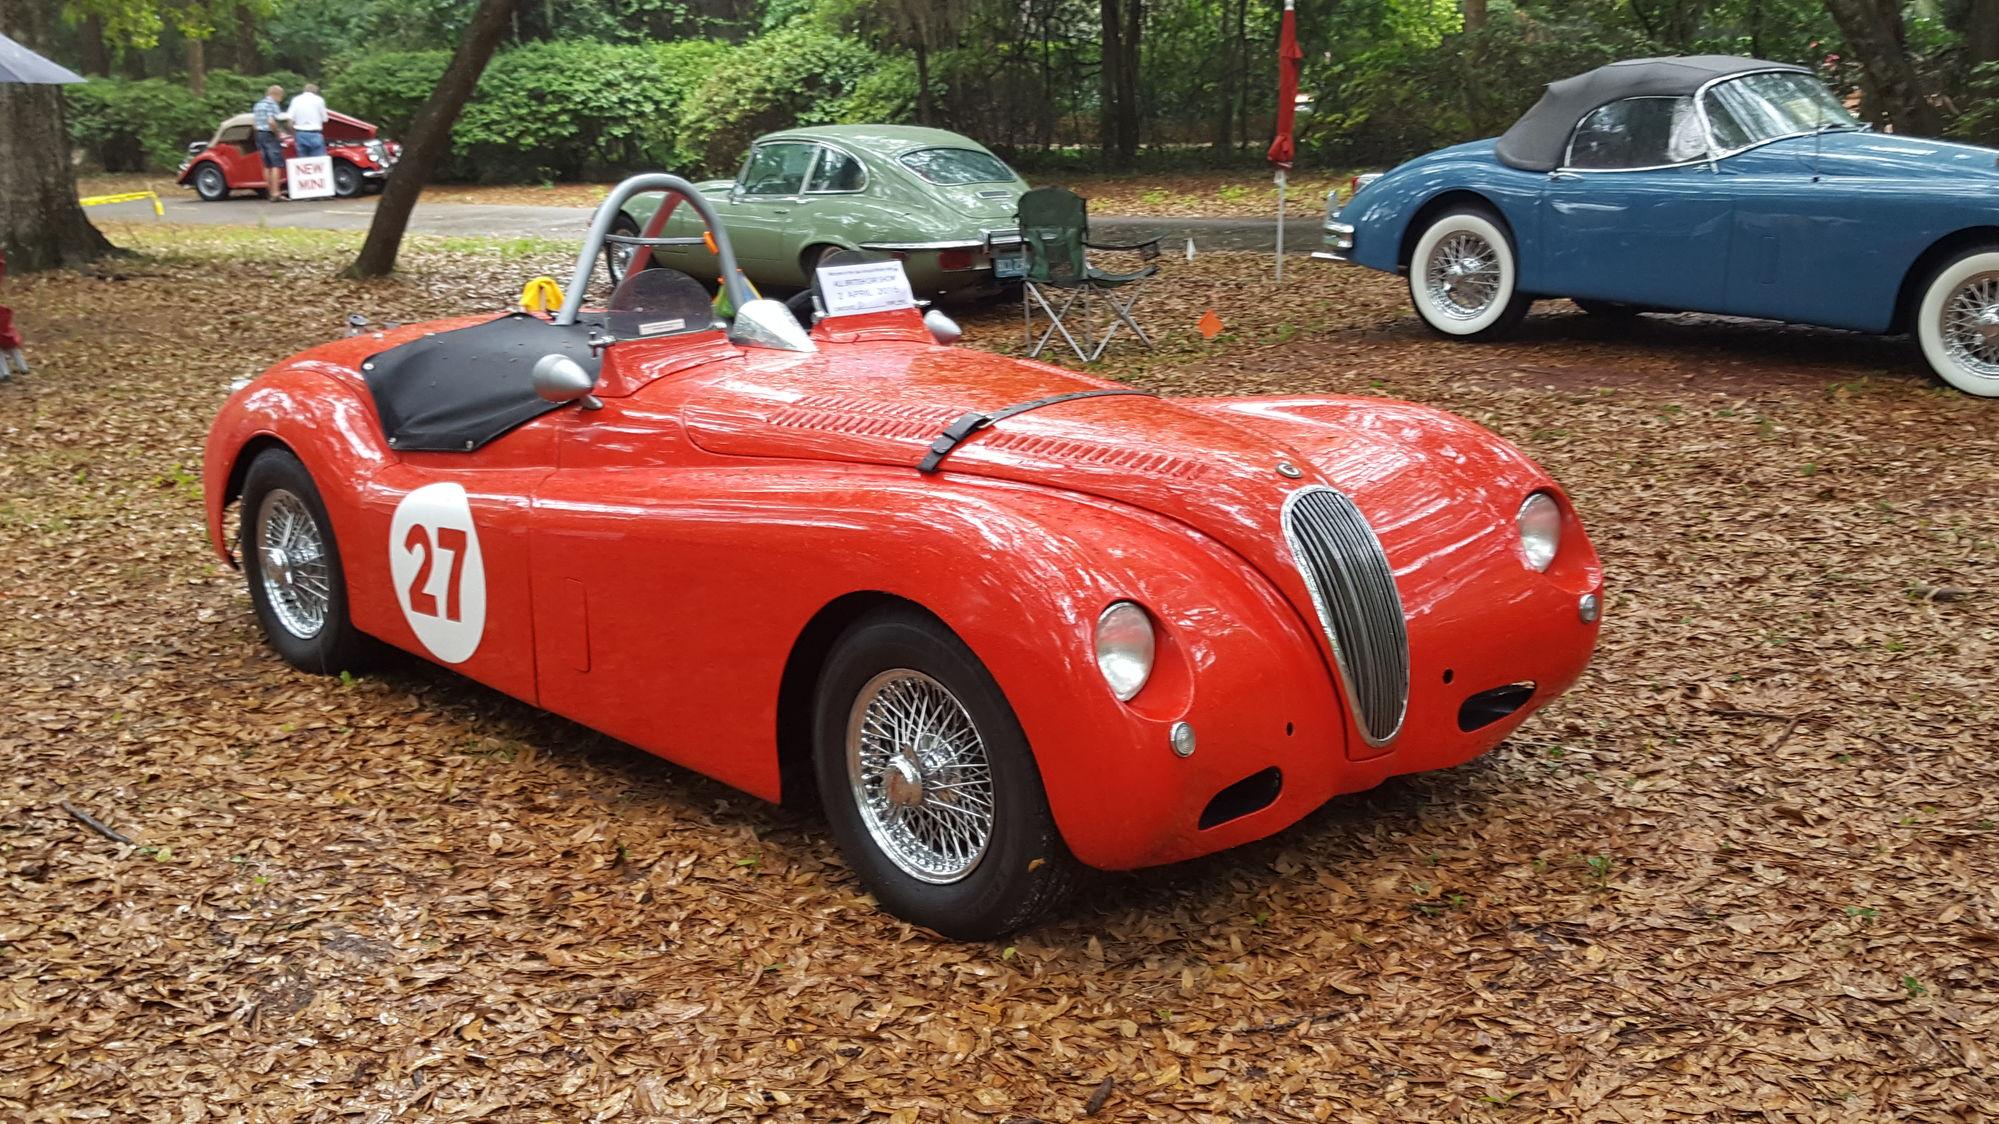 The all british car show - Jaguar Forums - Jaguar ...